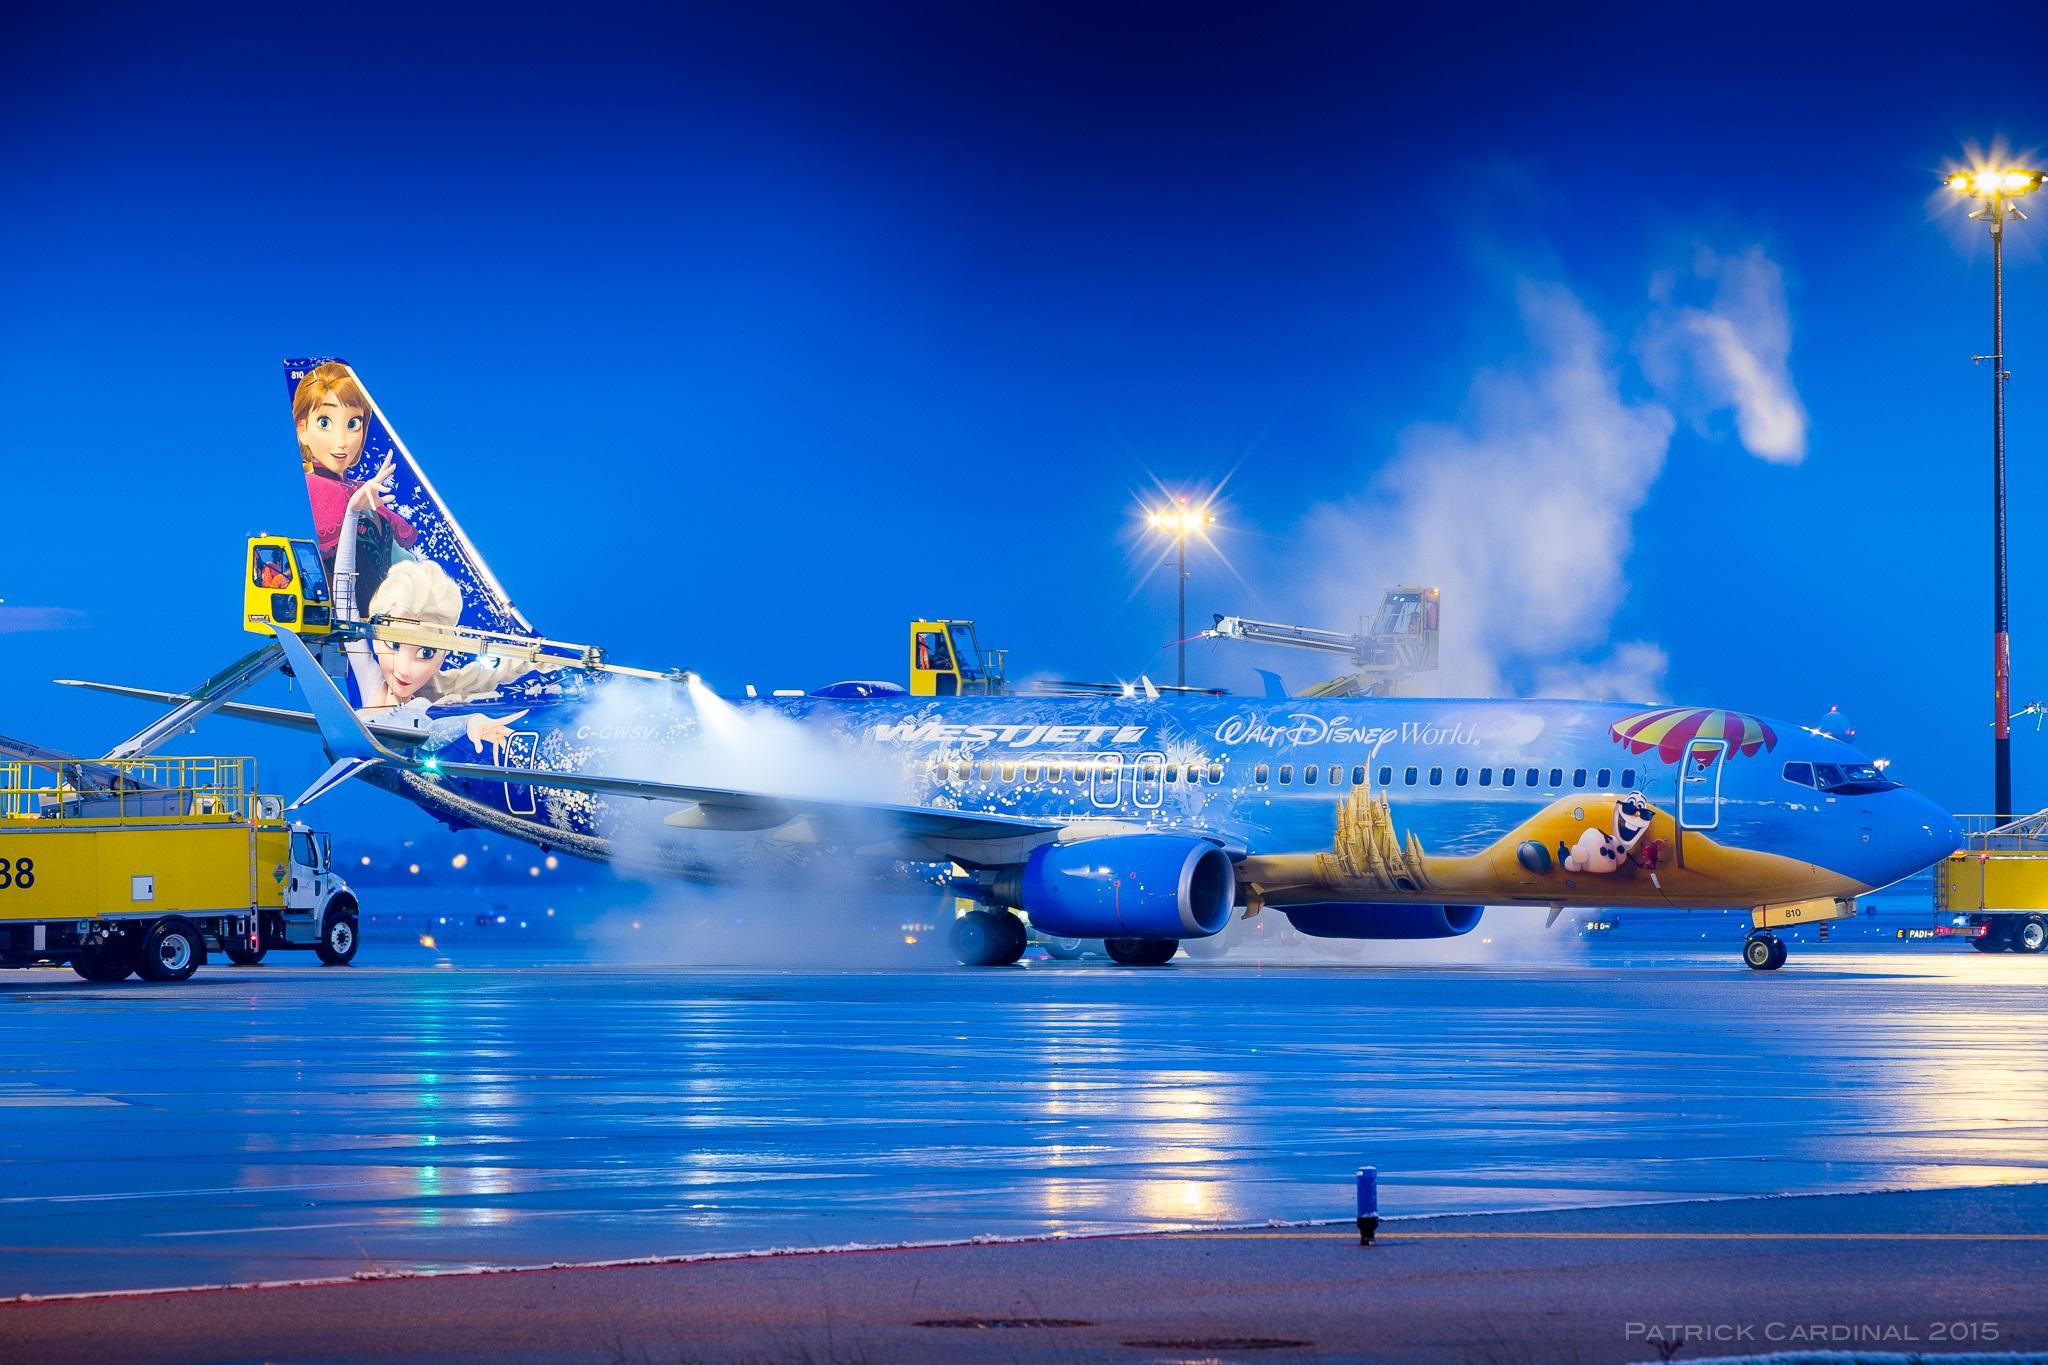 Airport ground crews de-icing a Frozen plane